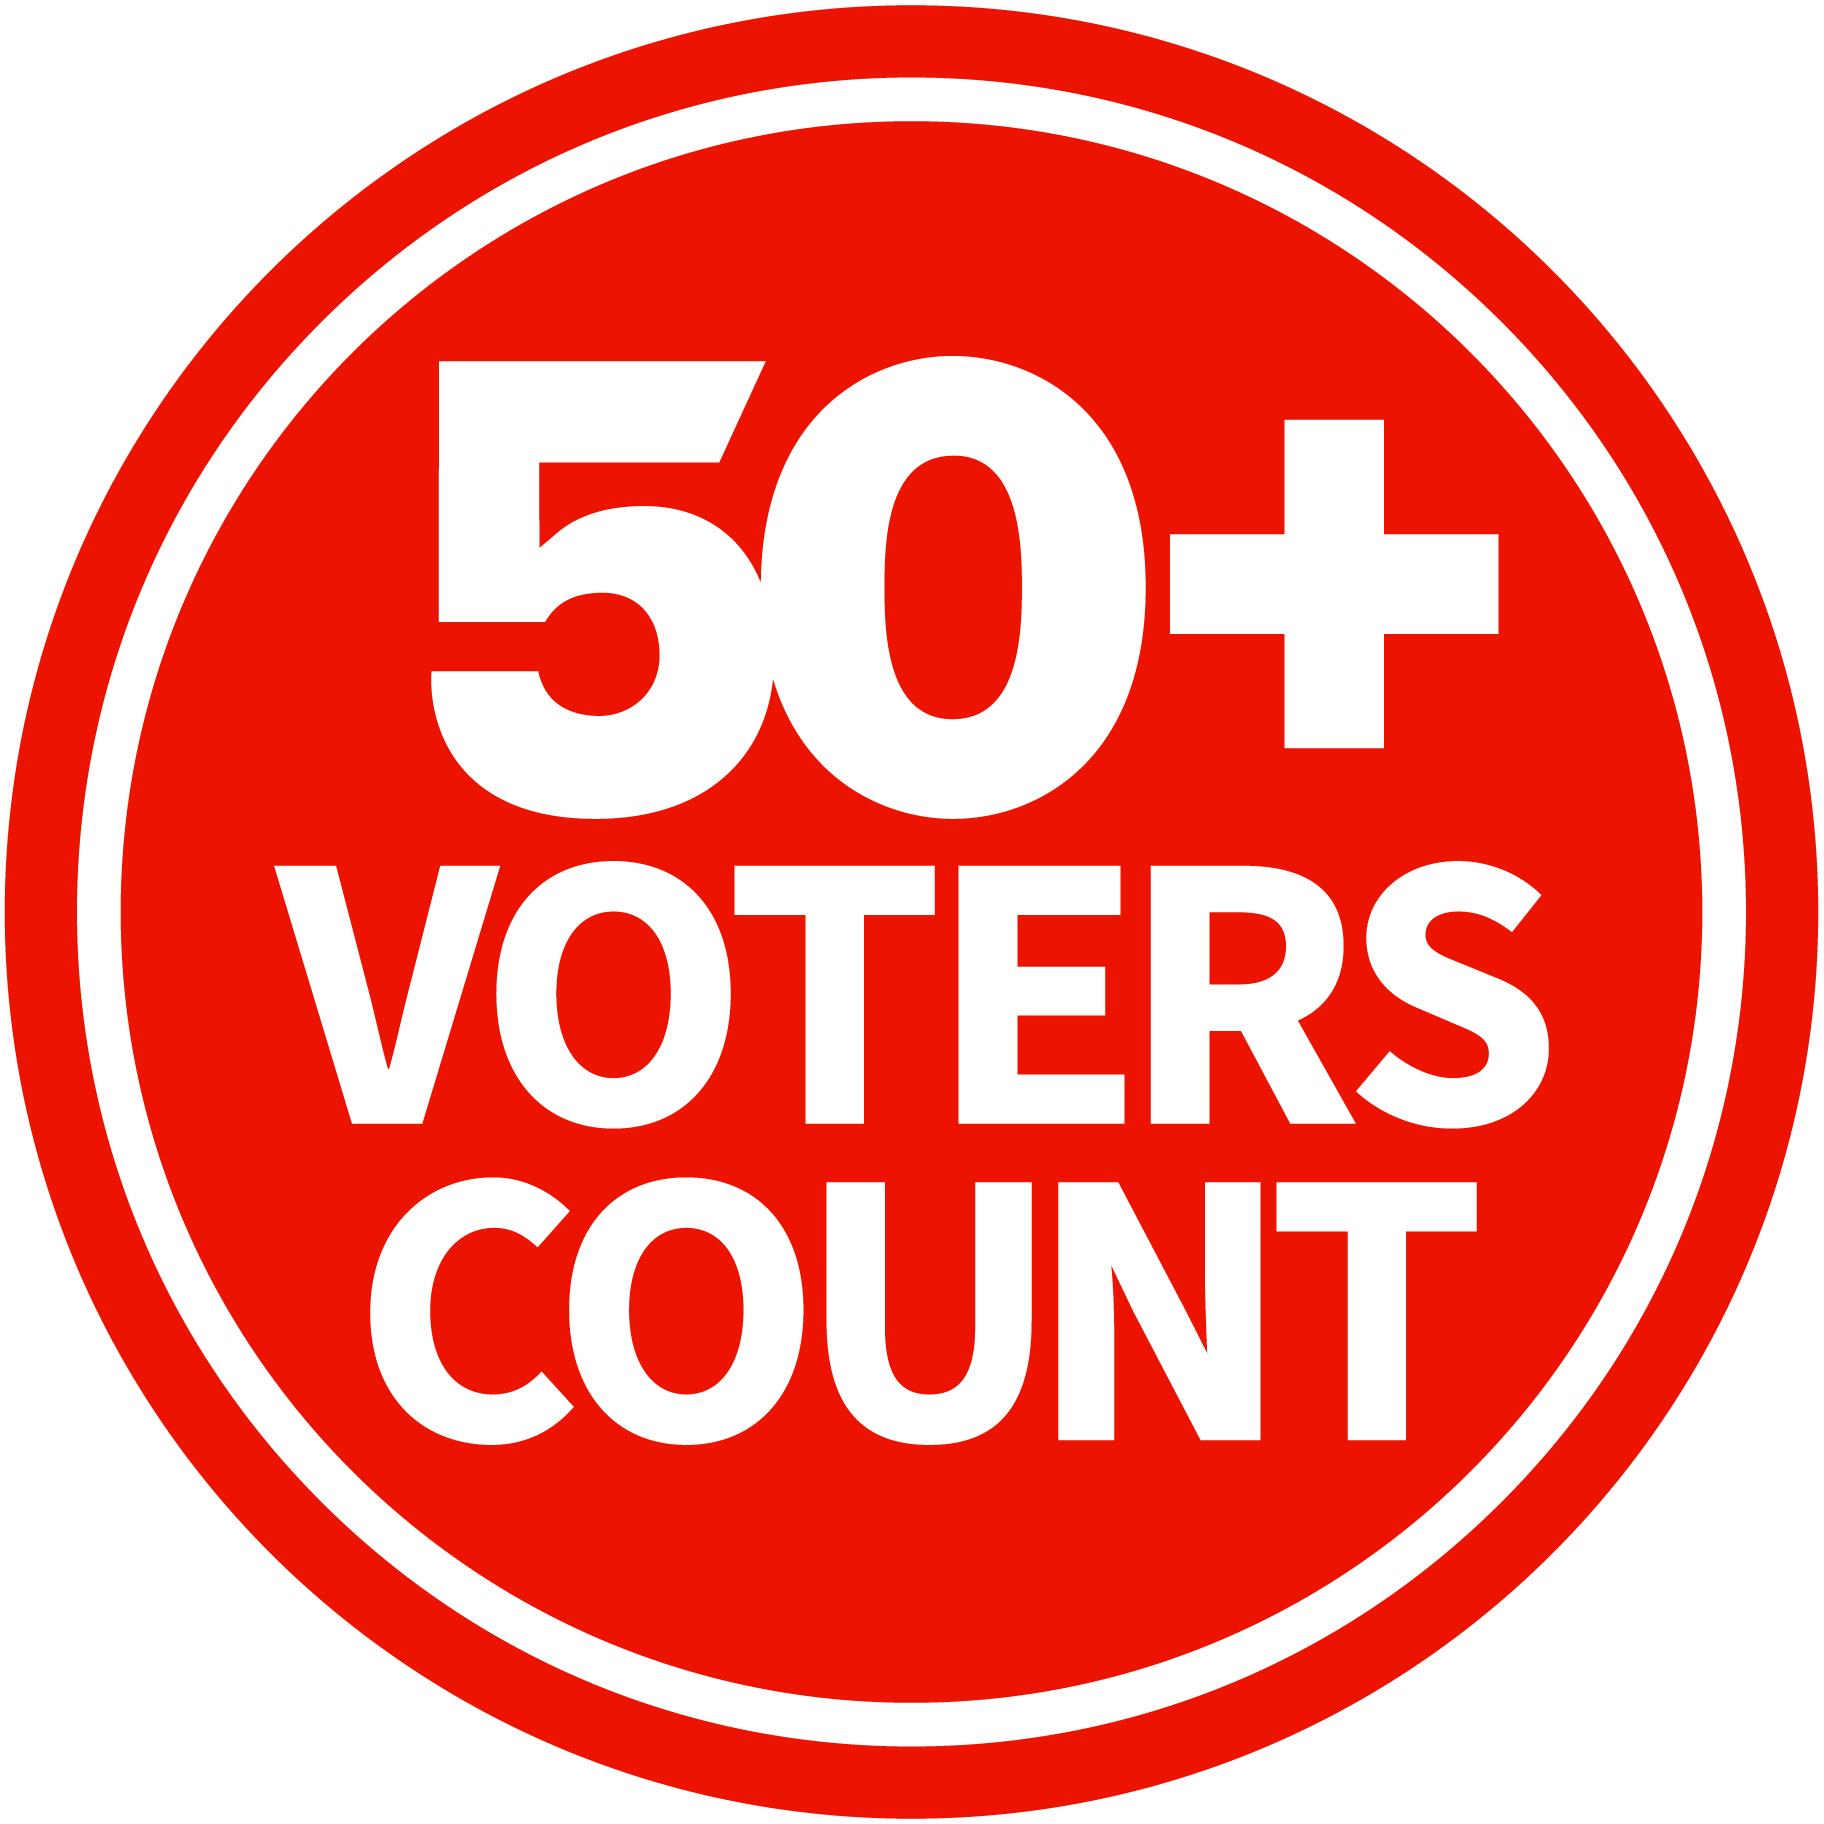 50+ Voters Count